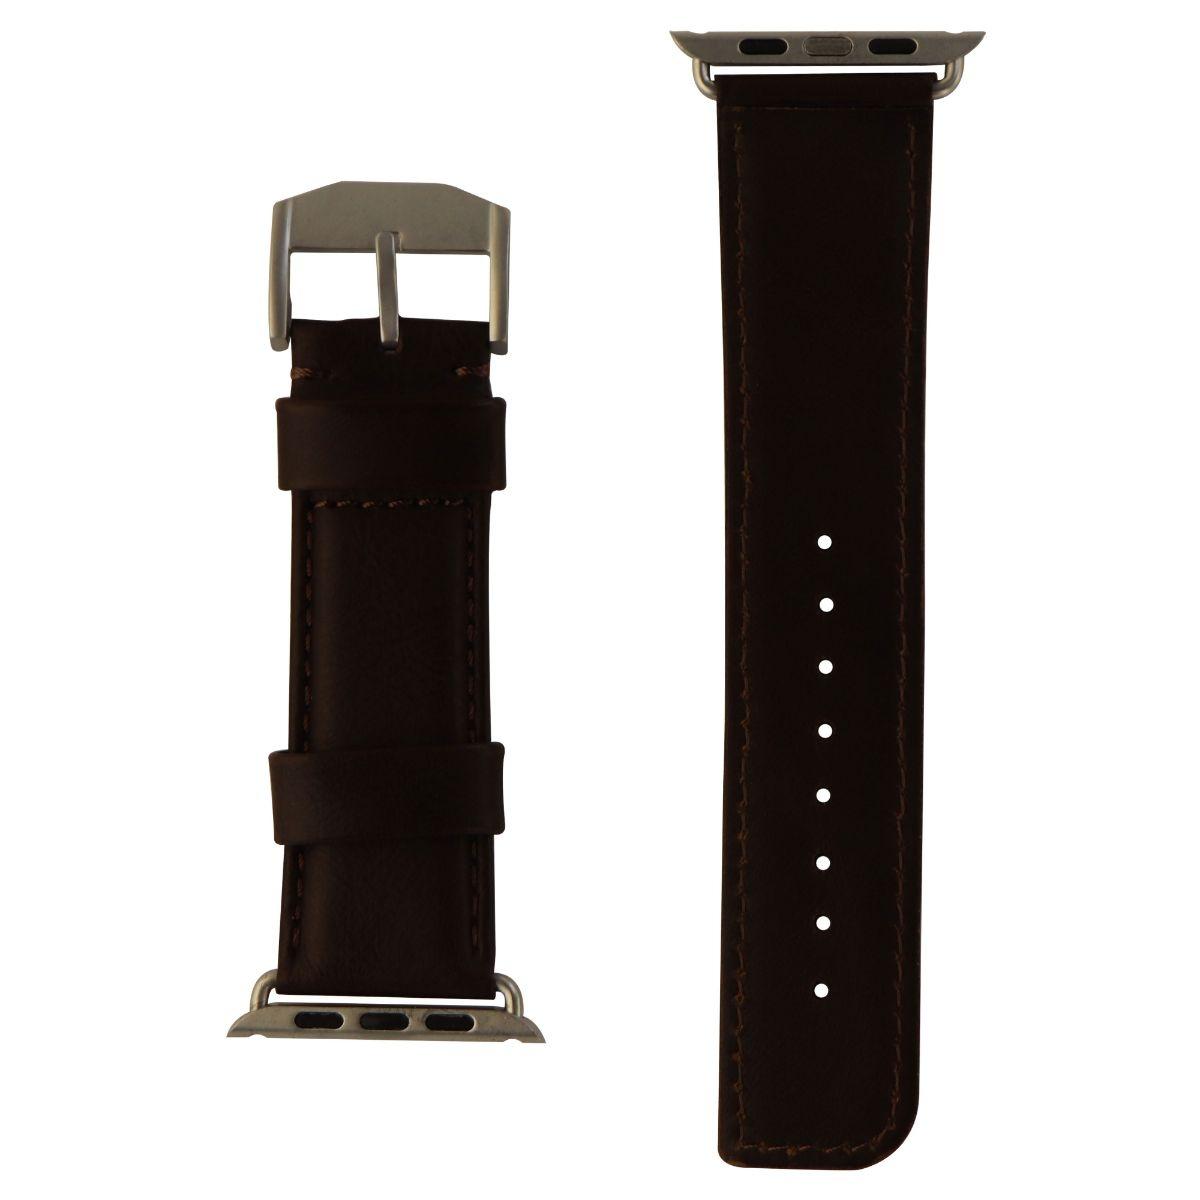 Case-Mate Apple Watch 42mm Signature Leather Watchband - Dark Brown